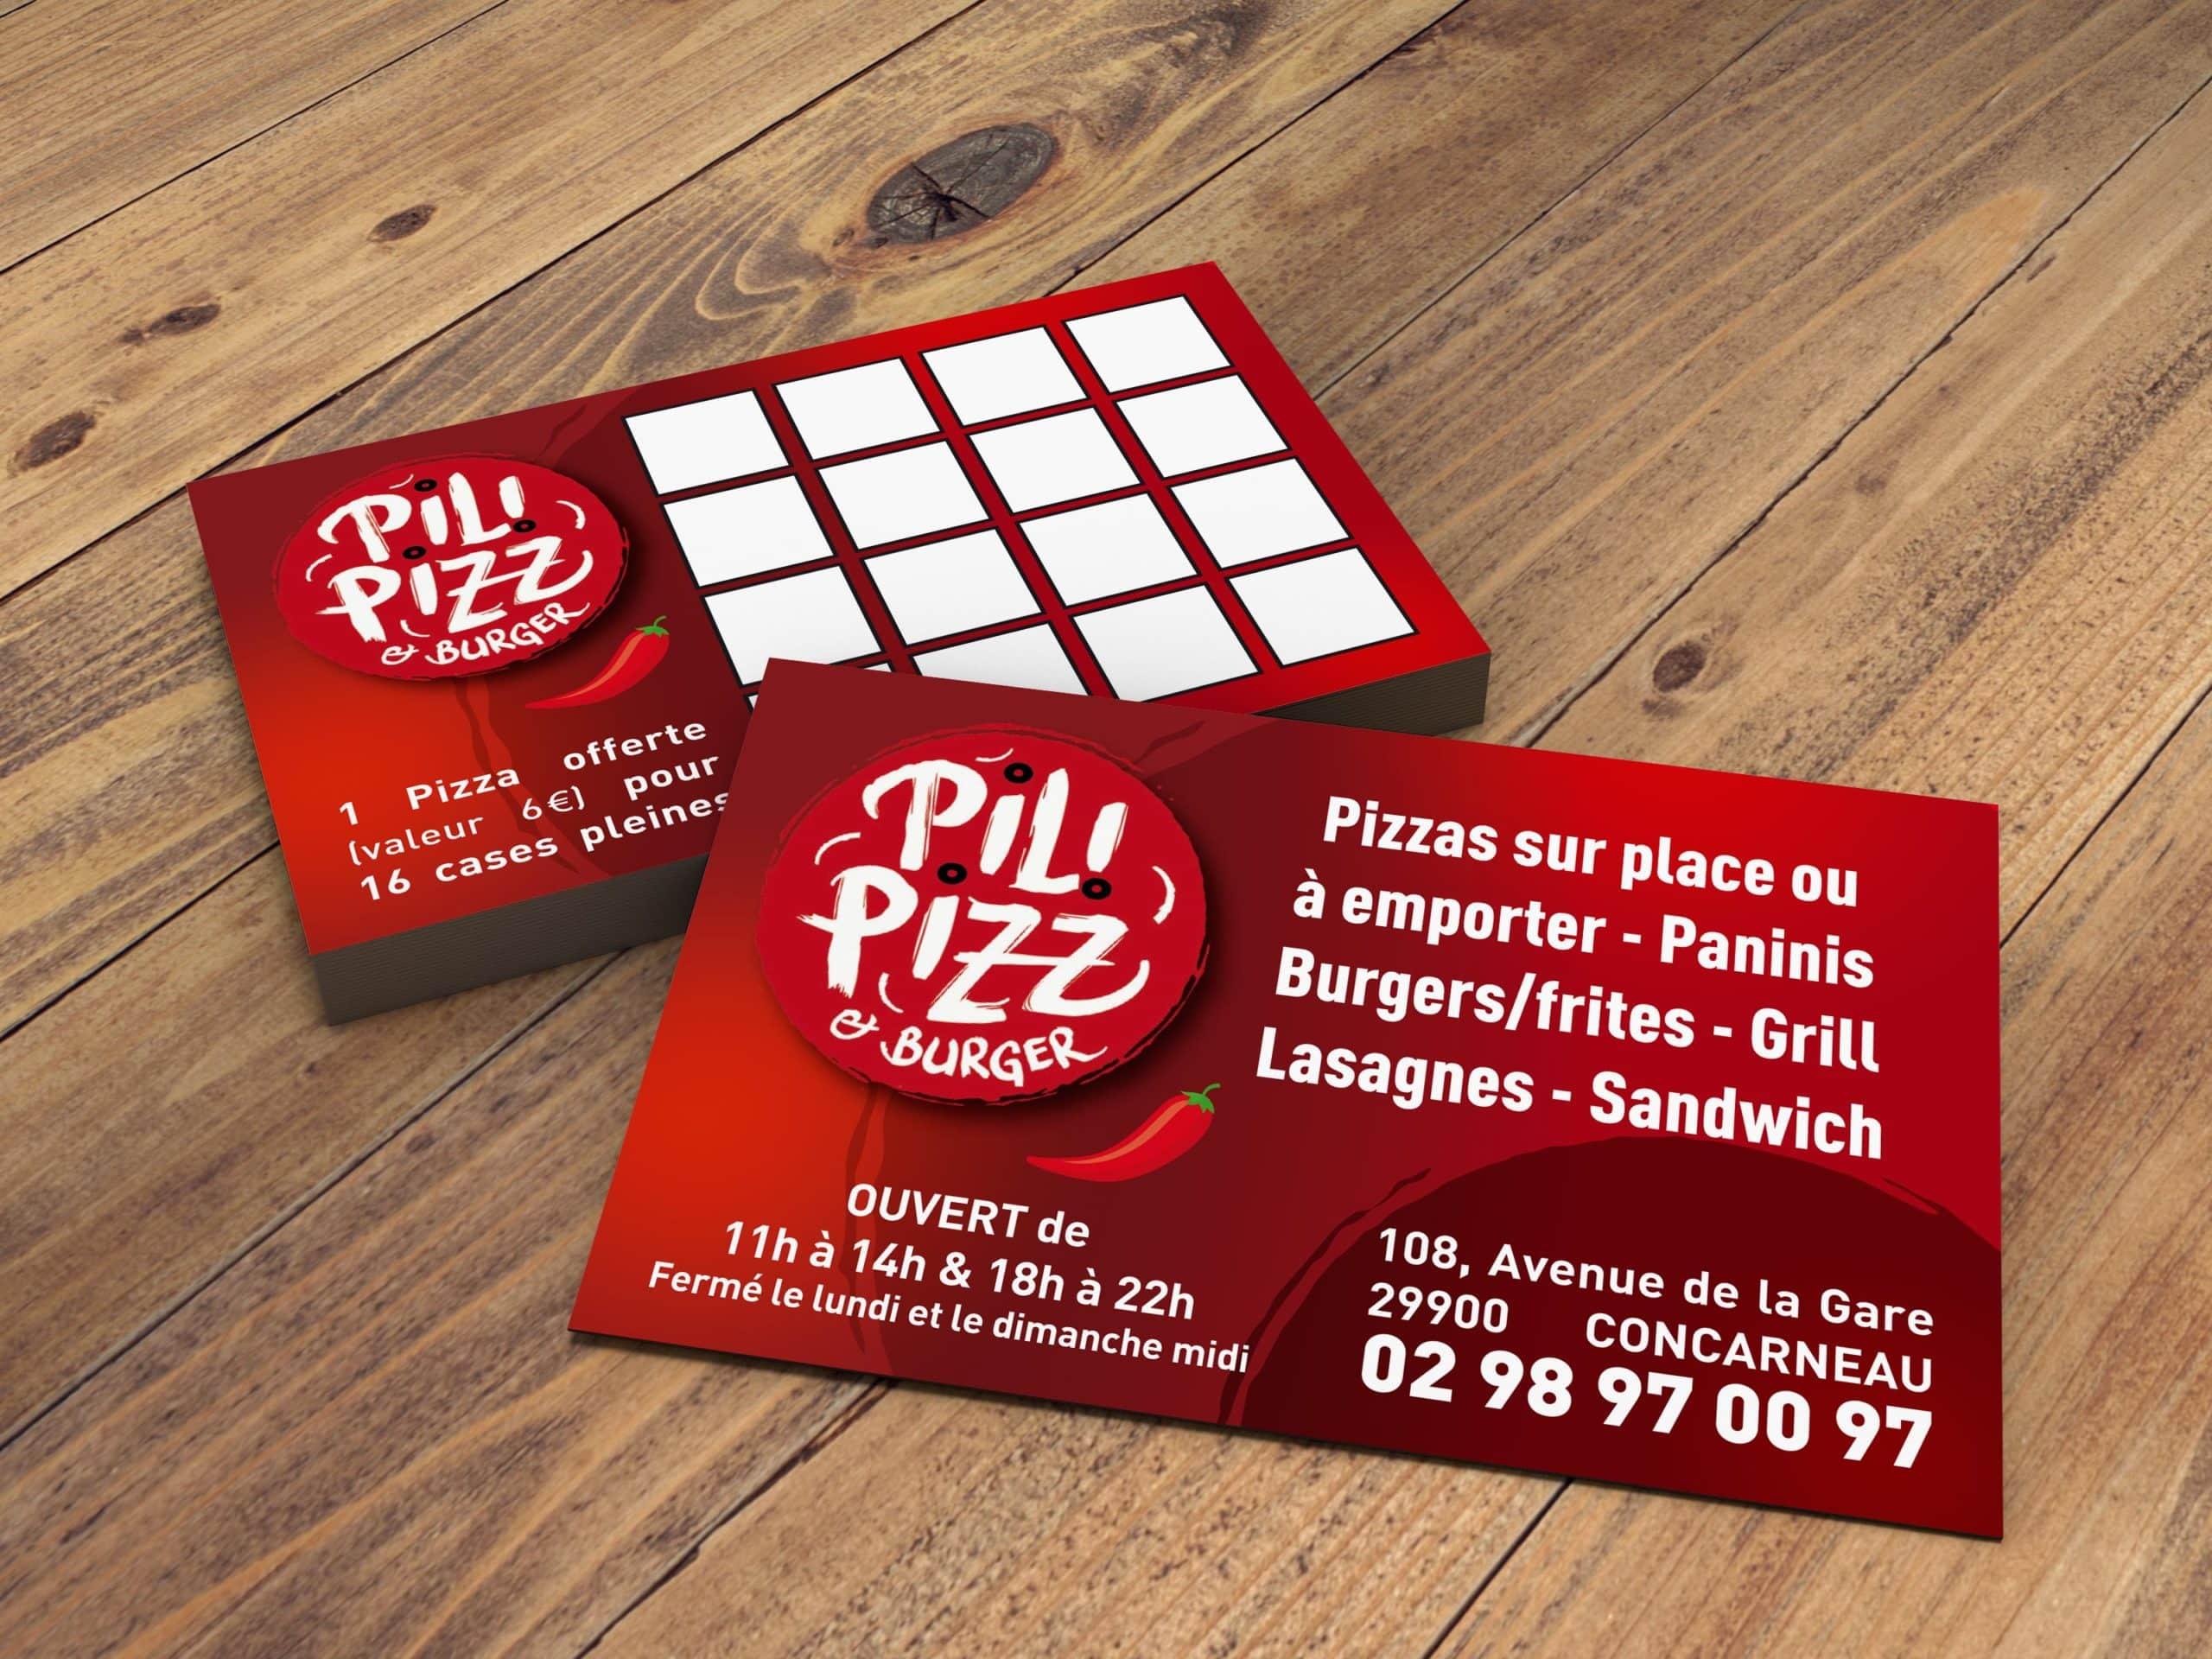 Pili Pizz - cartes recto verso - Concarneau